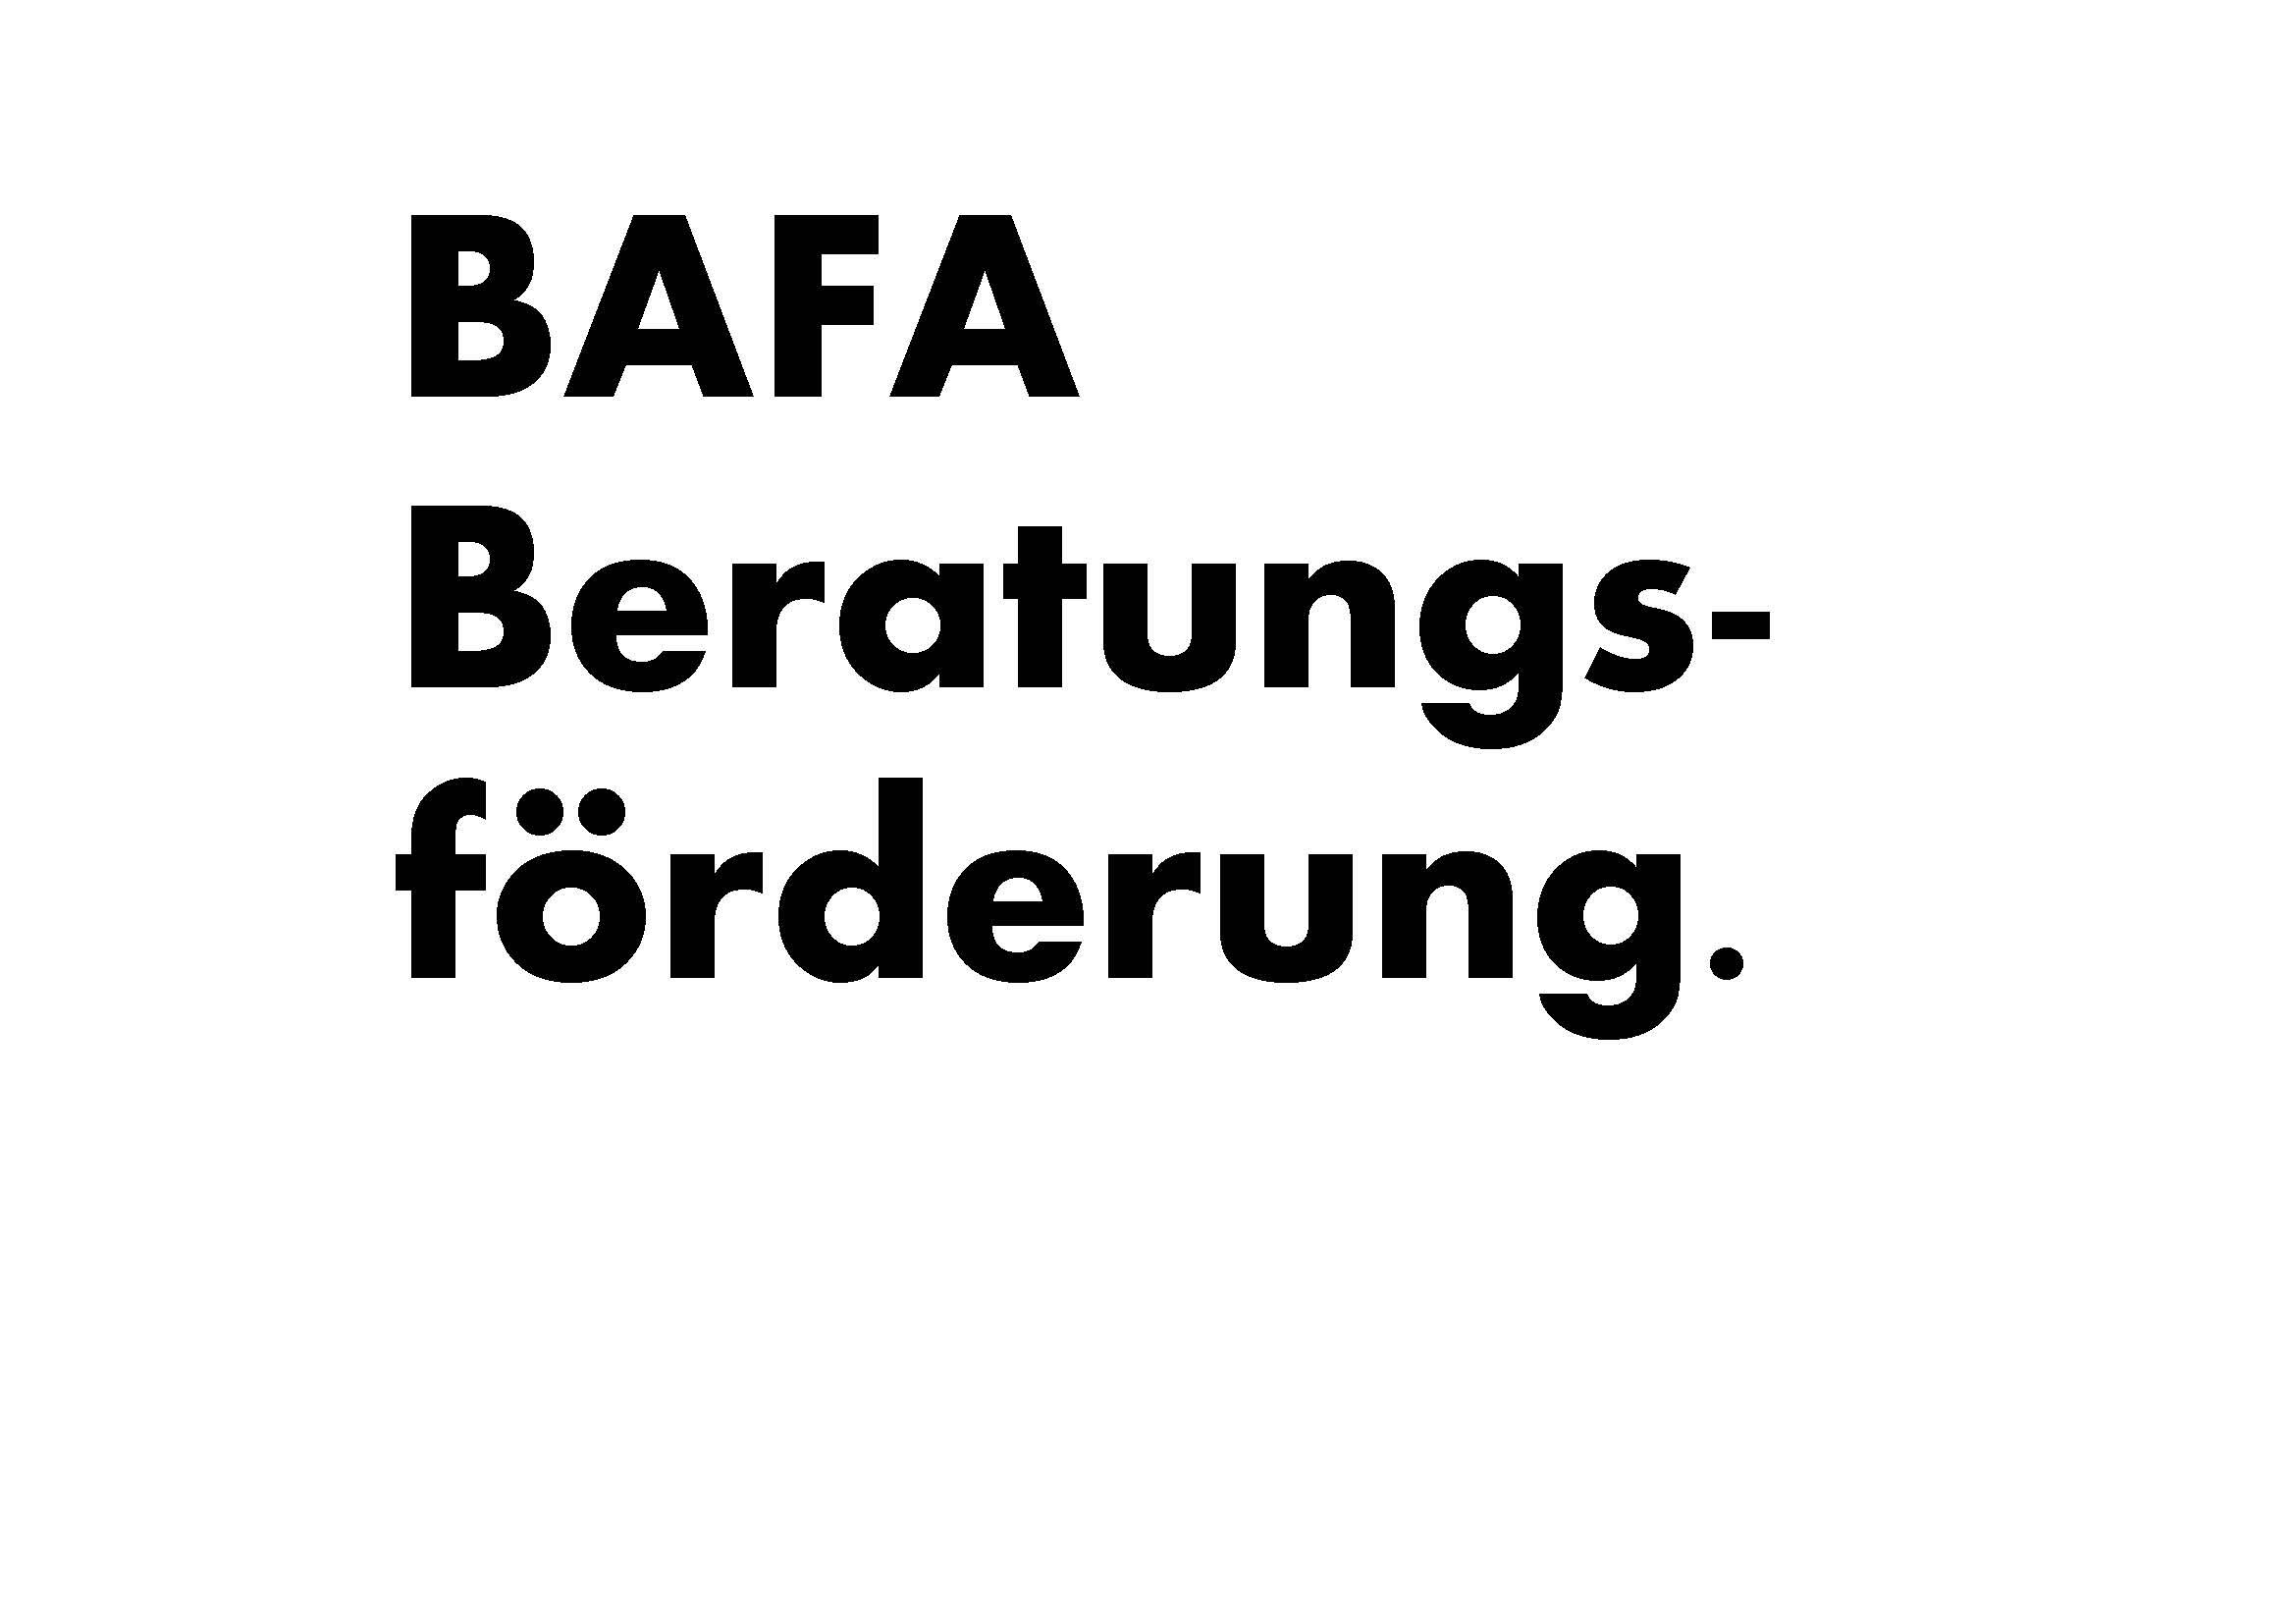 BAFA Beratungsförderung